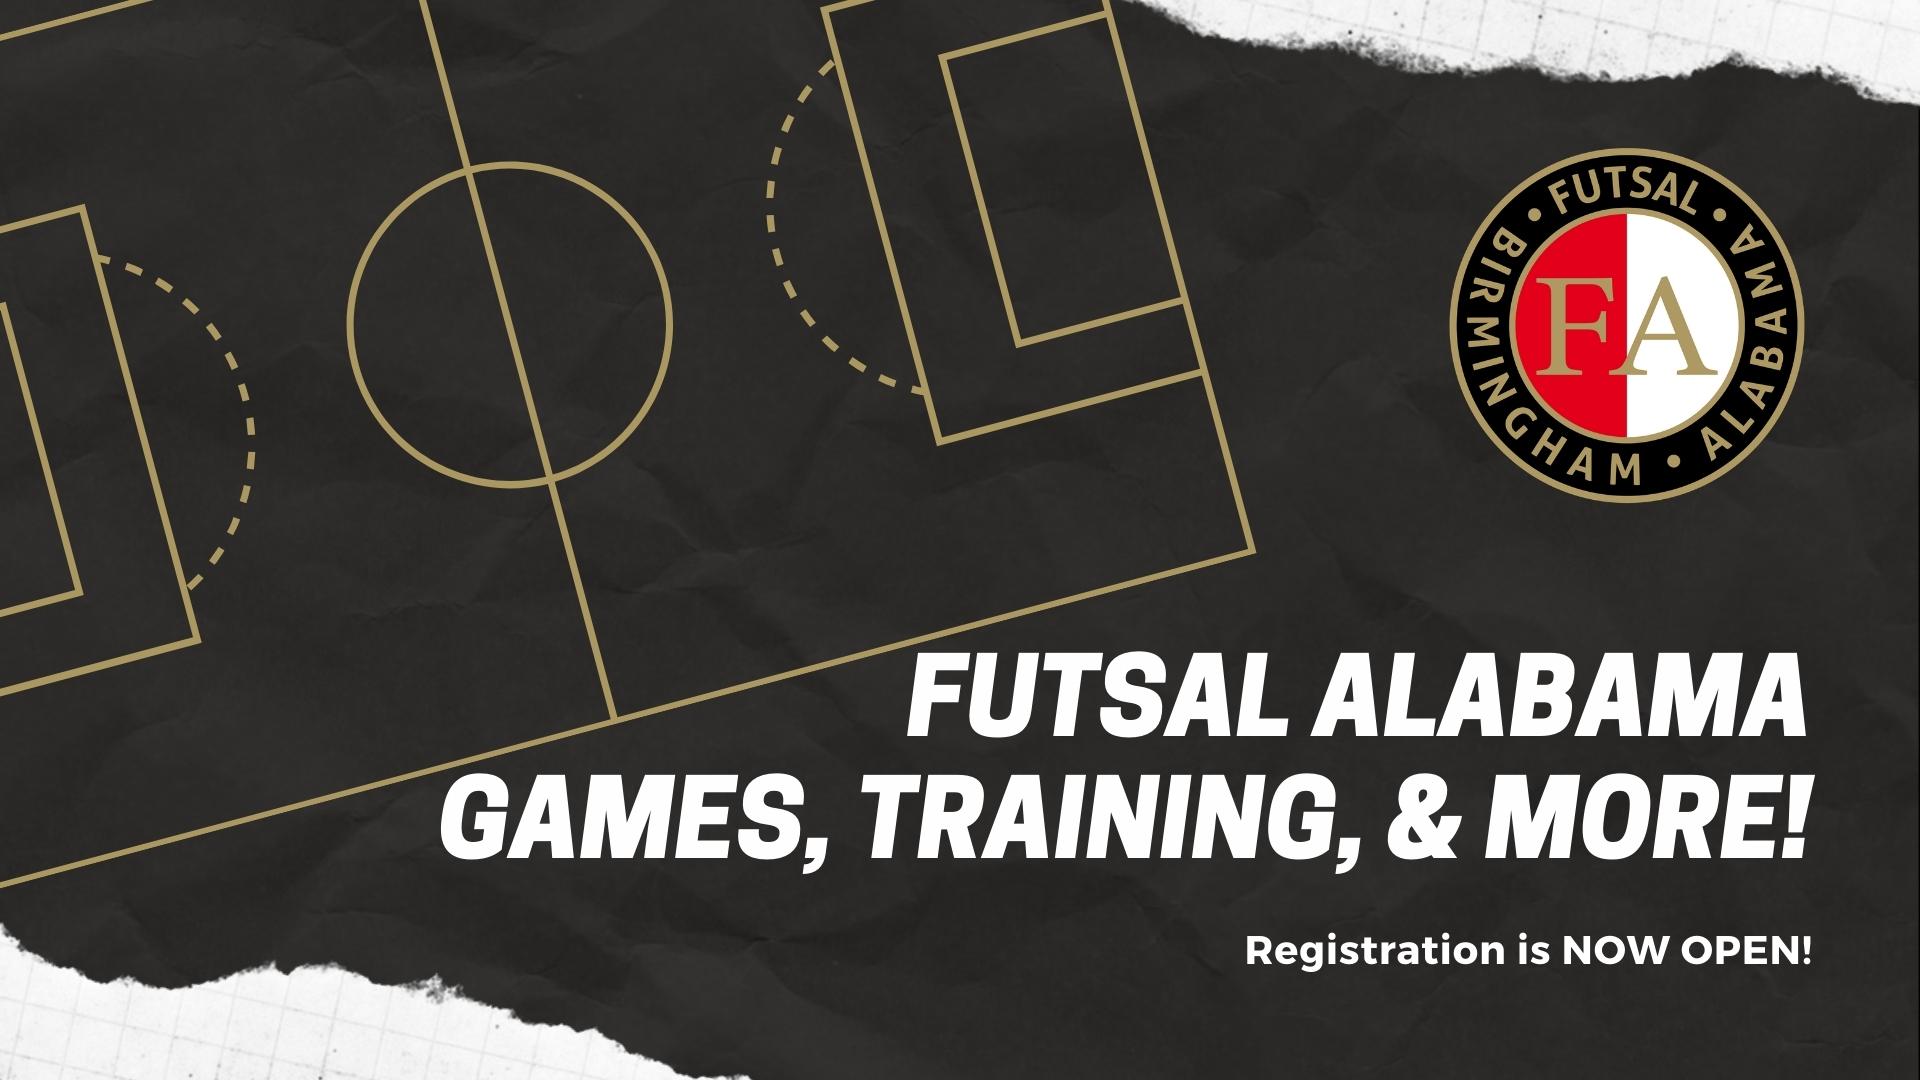 1920x1080 Futsal Alabama Games Training